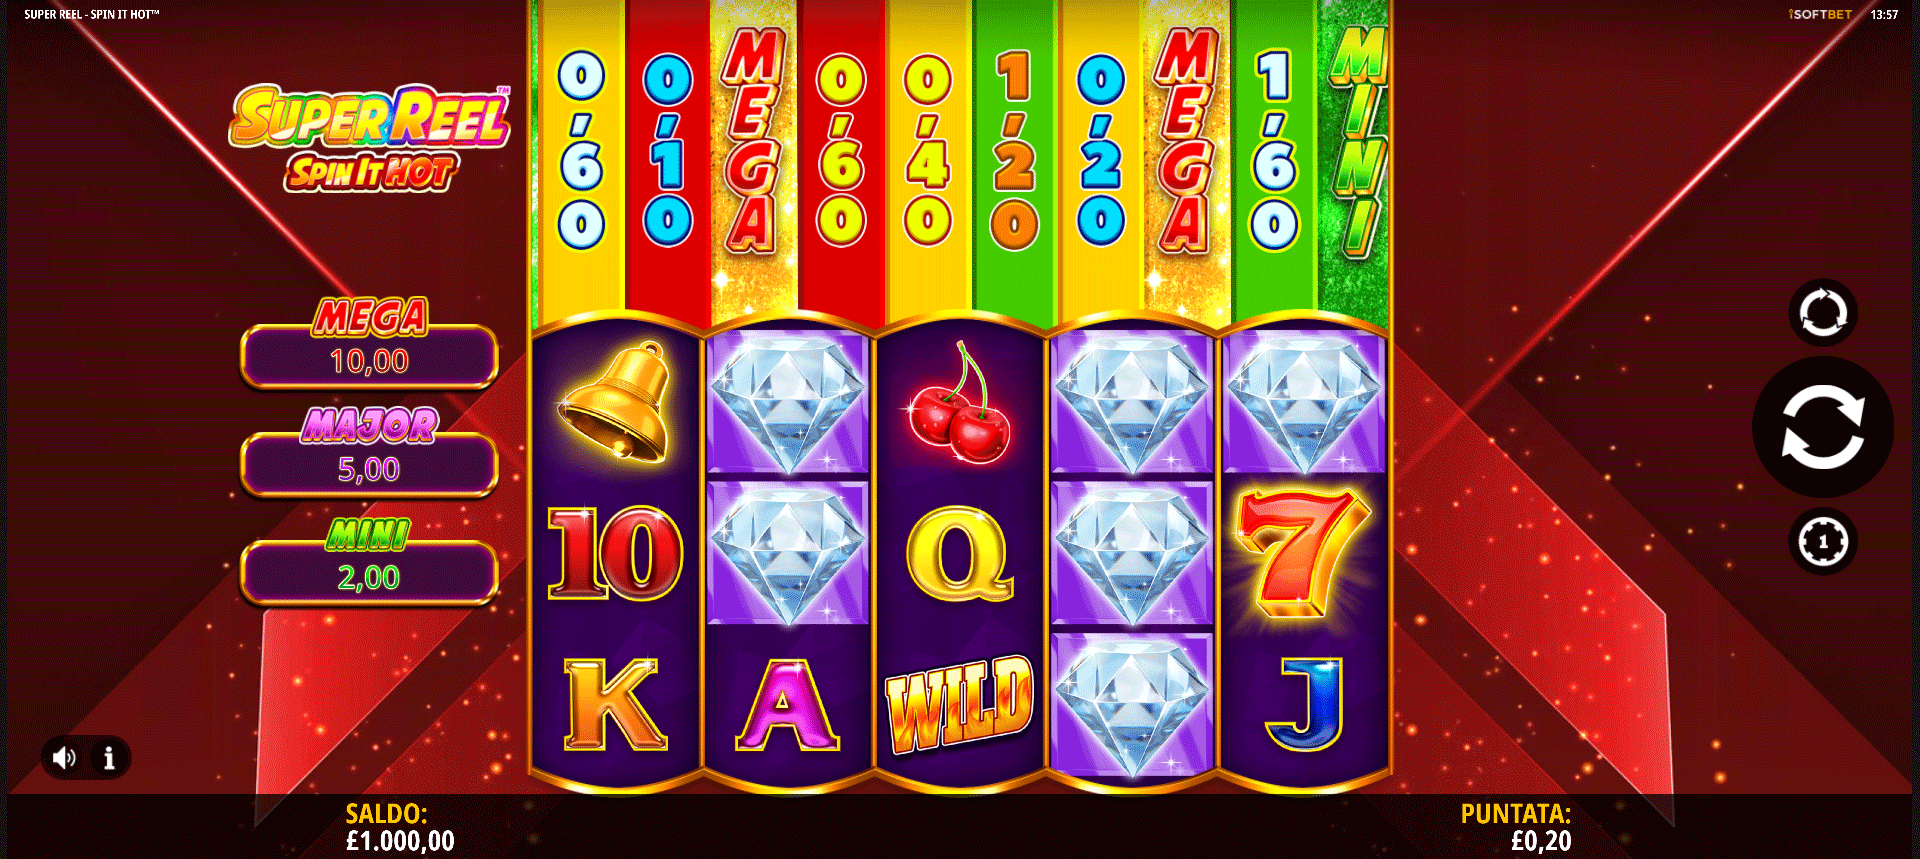 Slot Super Reel: Spin it Hot